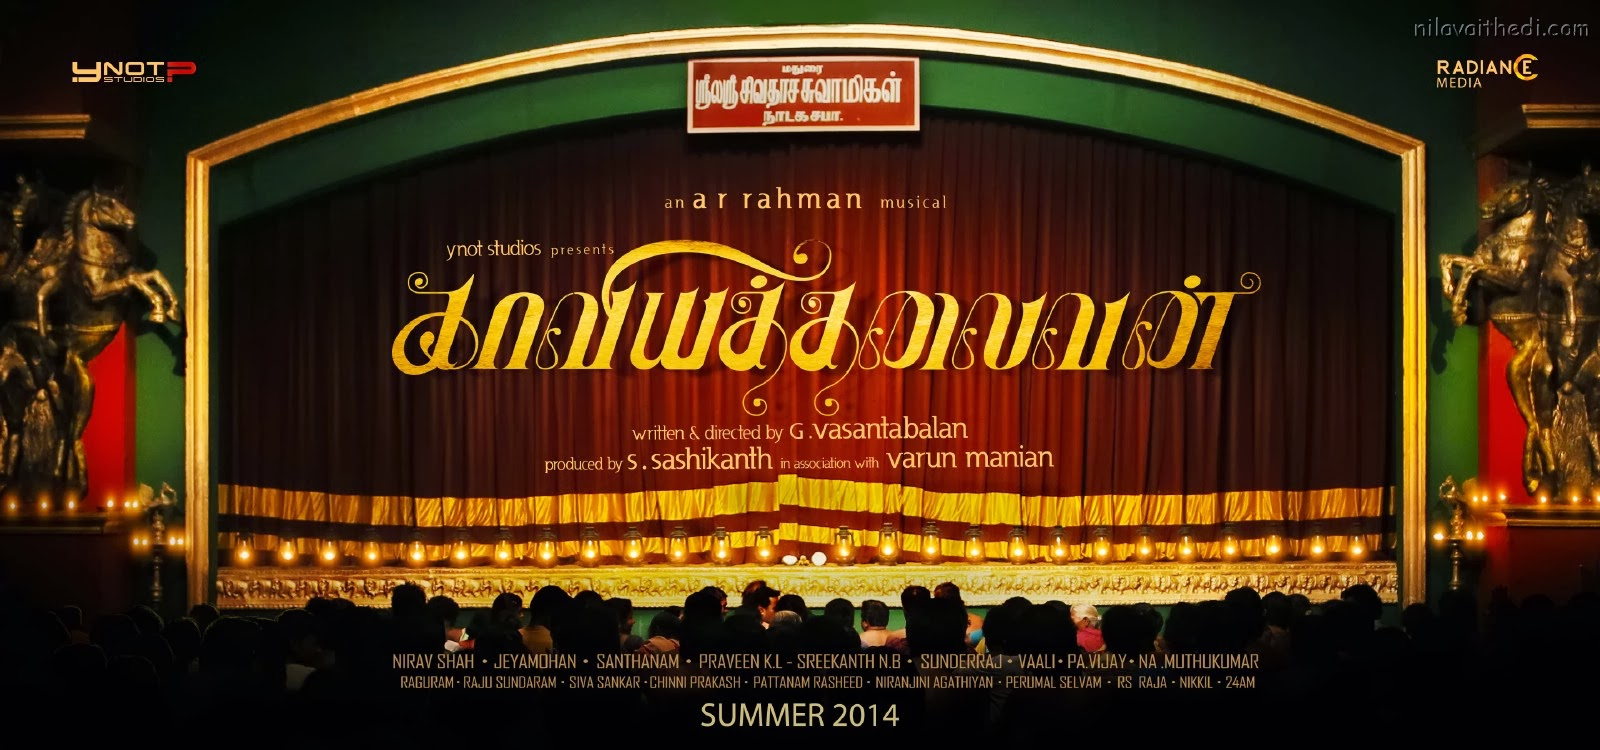 Kaaviyathalaivan Tamil Movie First Look Poster Cast and Crew